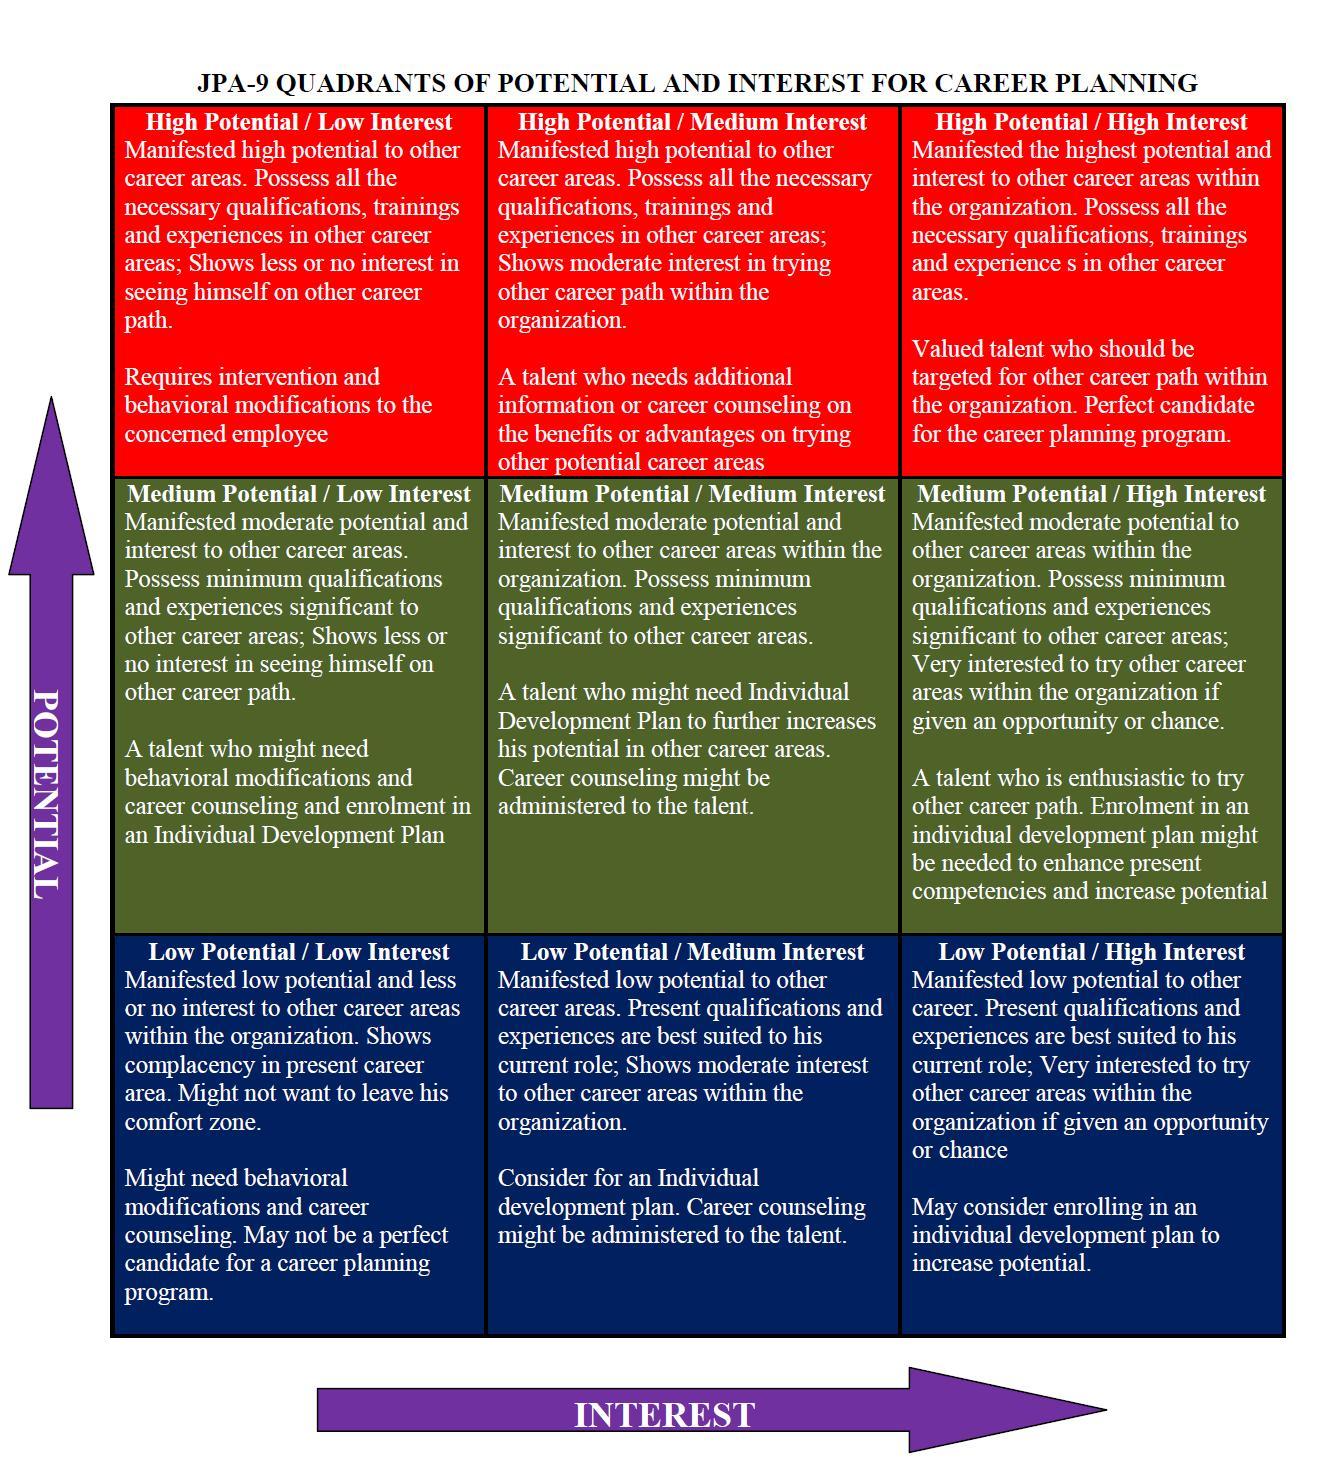 file jpa quadrant of potential and interest for career planning file jpa 9 quadrant of potential and interest for career planning jpg